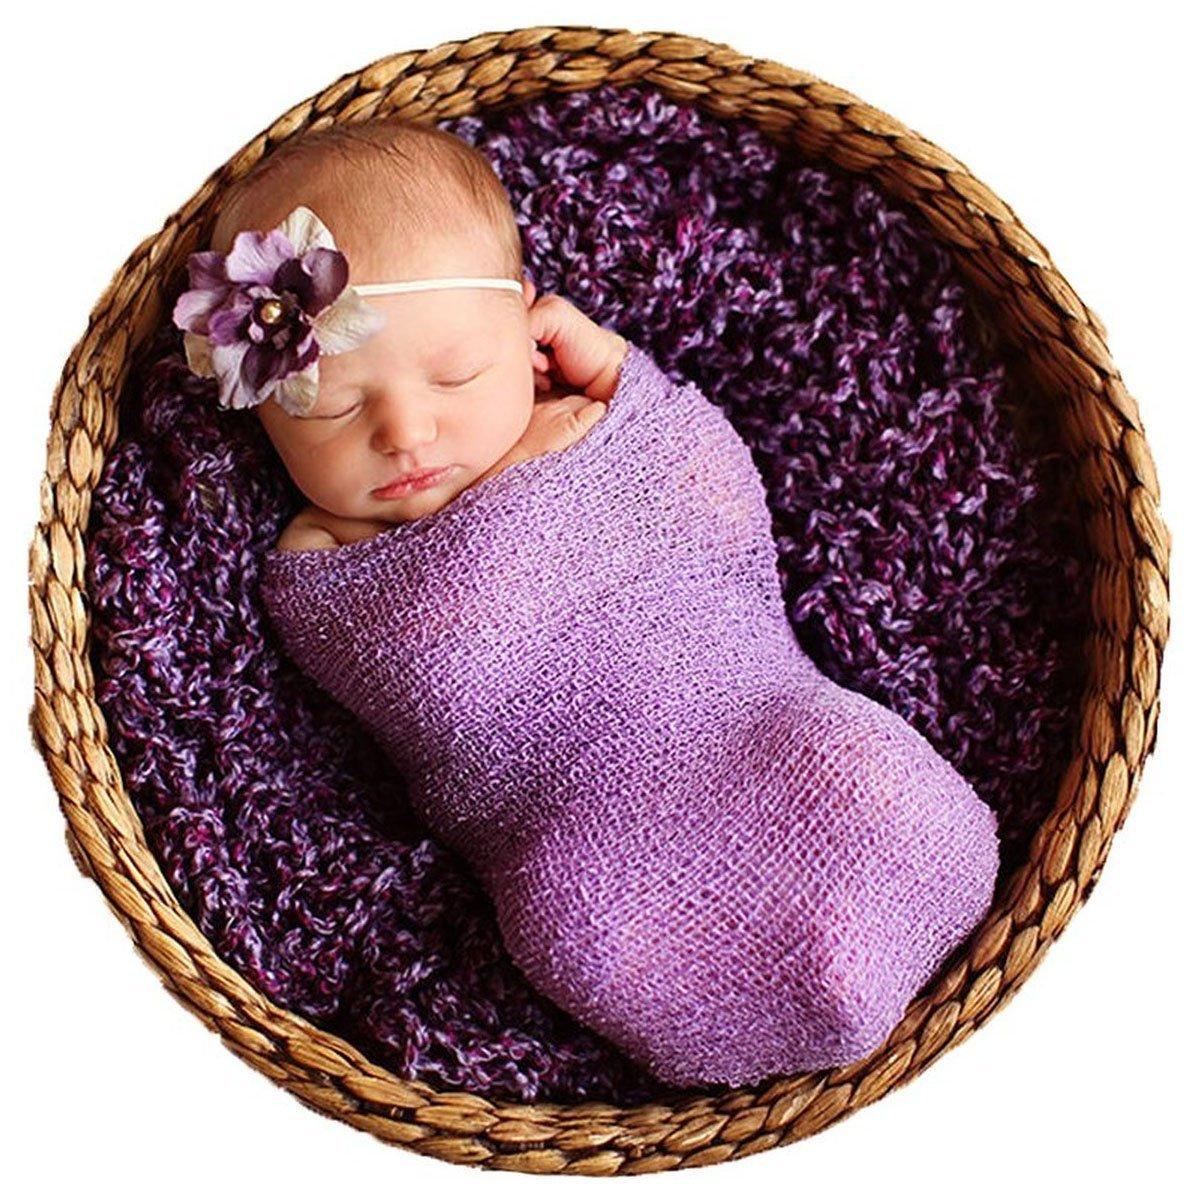 Amazon.com: Sunmig Newborn Baby Stretch Wrap Photo Props